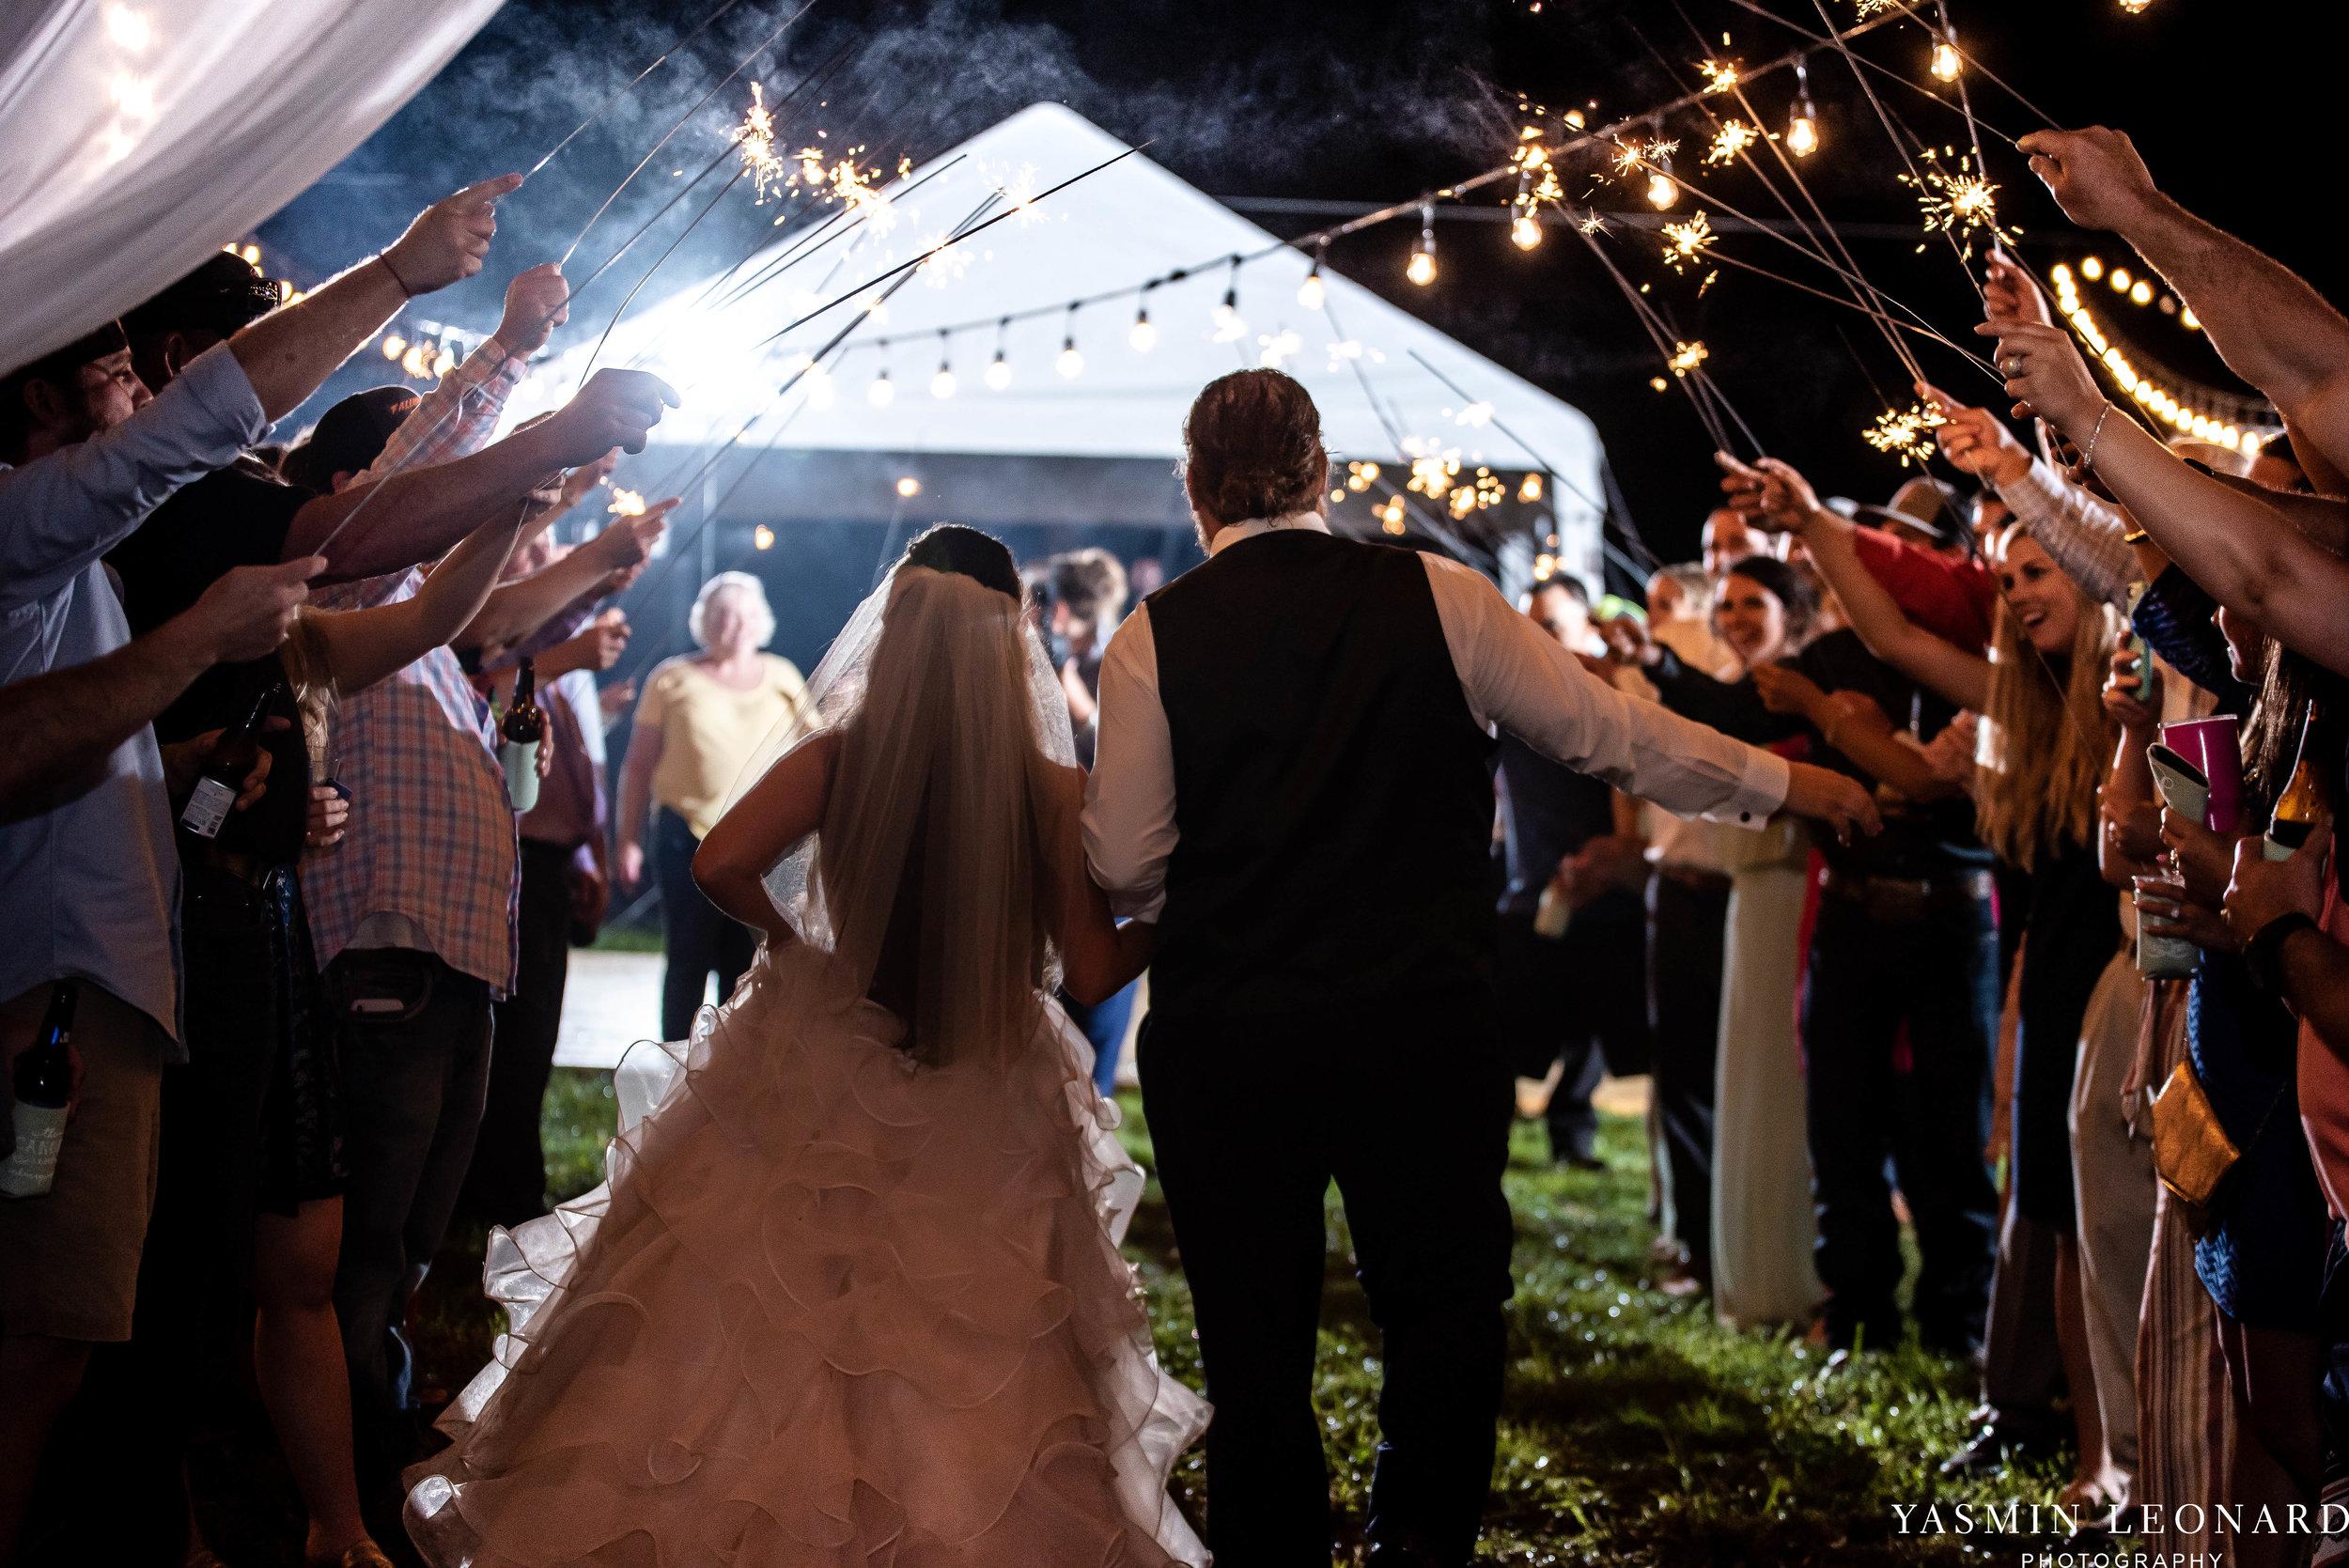 Rain on your wedding day - Rainy Wedding - Plan B for Rain - What to do if it rains on your wedding day - Wedding Inspiration - Outdoor wedding ideas - Rainy Wedding Pictures - Yasmin Leonard Photography-92.jpg